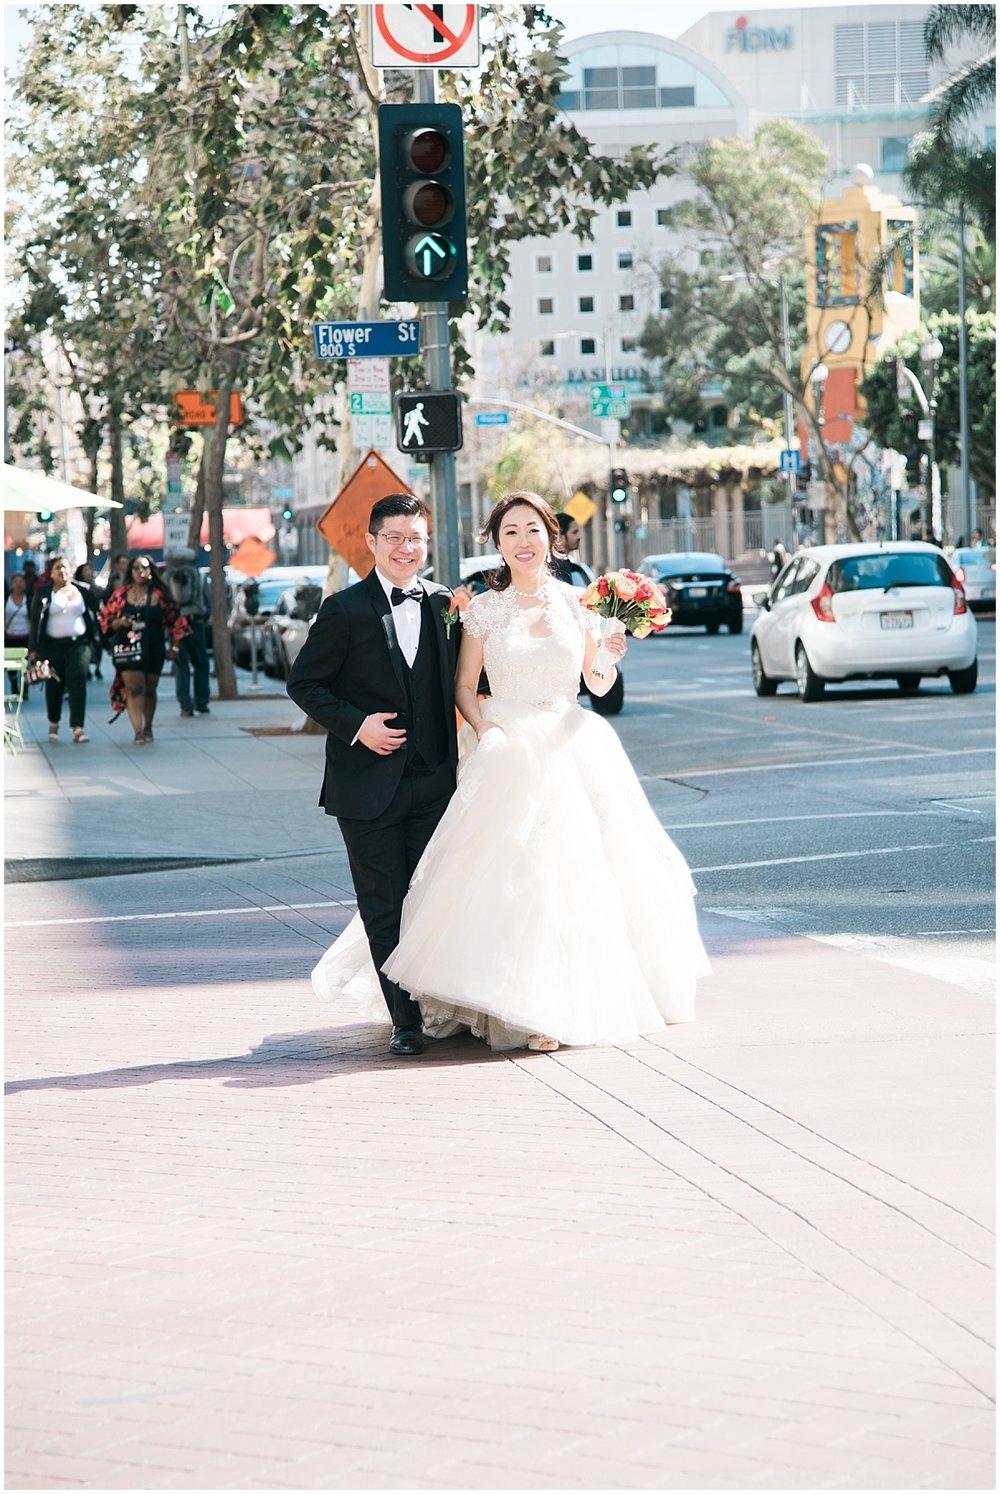 Faith-and-Flower-Wedding-Soo-Dan-Carissa-Woo-Photography_0058.jpg